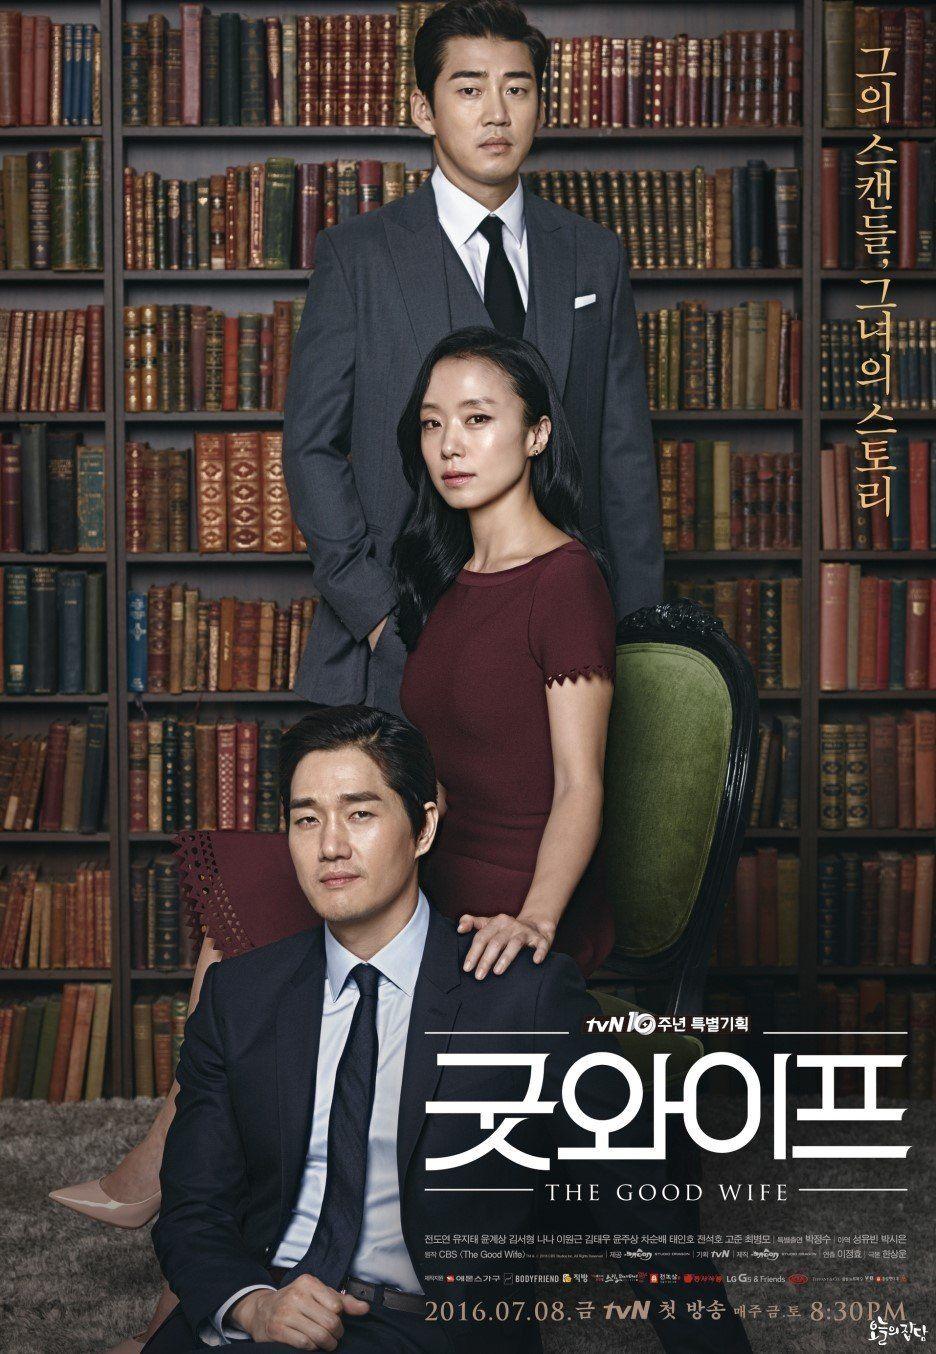 The Good Wife 굿 와이프 Korean Drama Picture The Good Wife Korean Good Wife Korean Tv Series